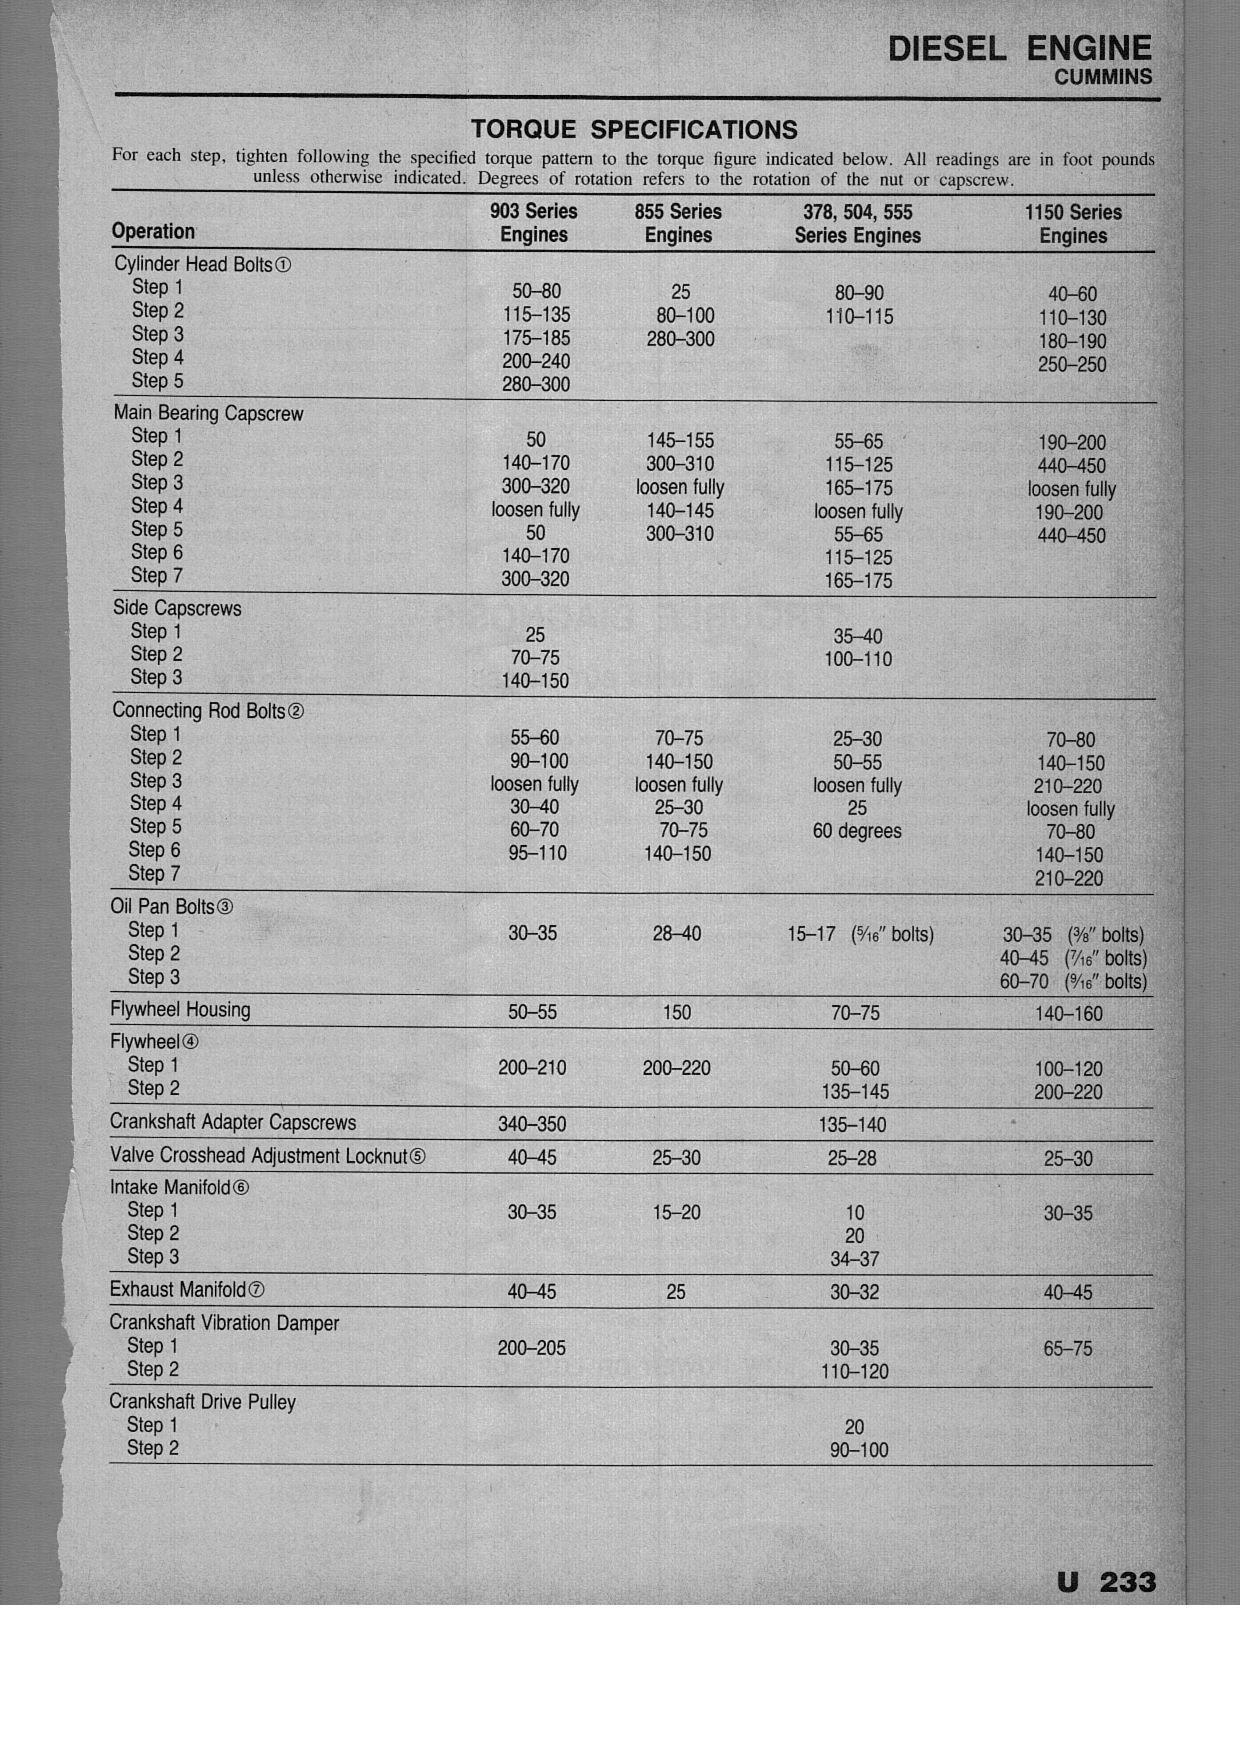 Need Engine Torque Specs For Cummins V378c 155 Engine